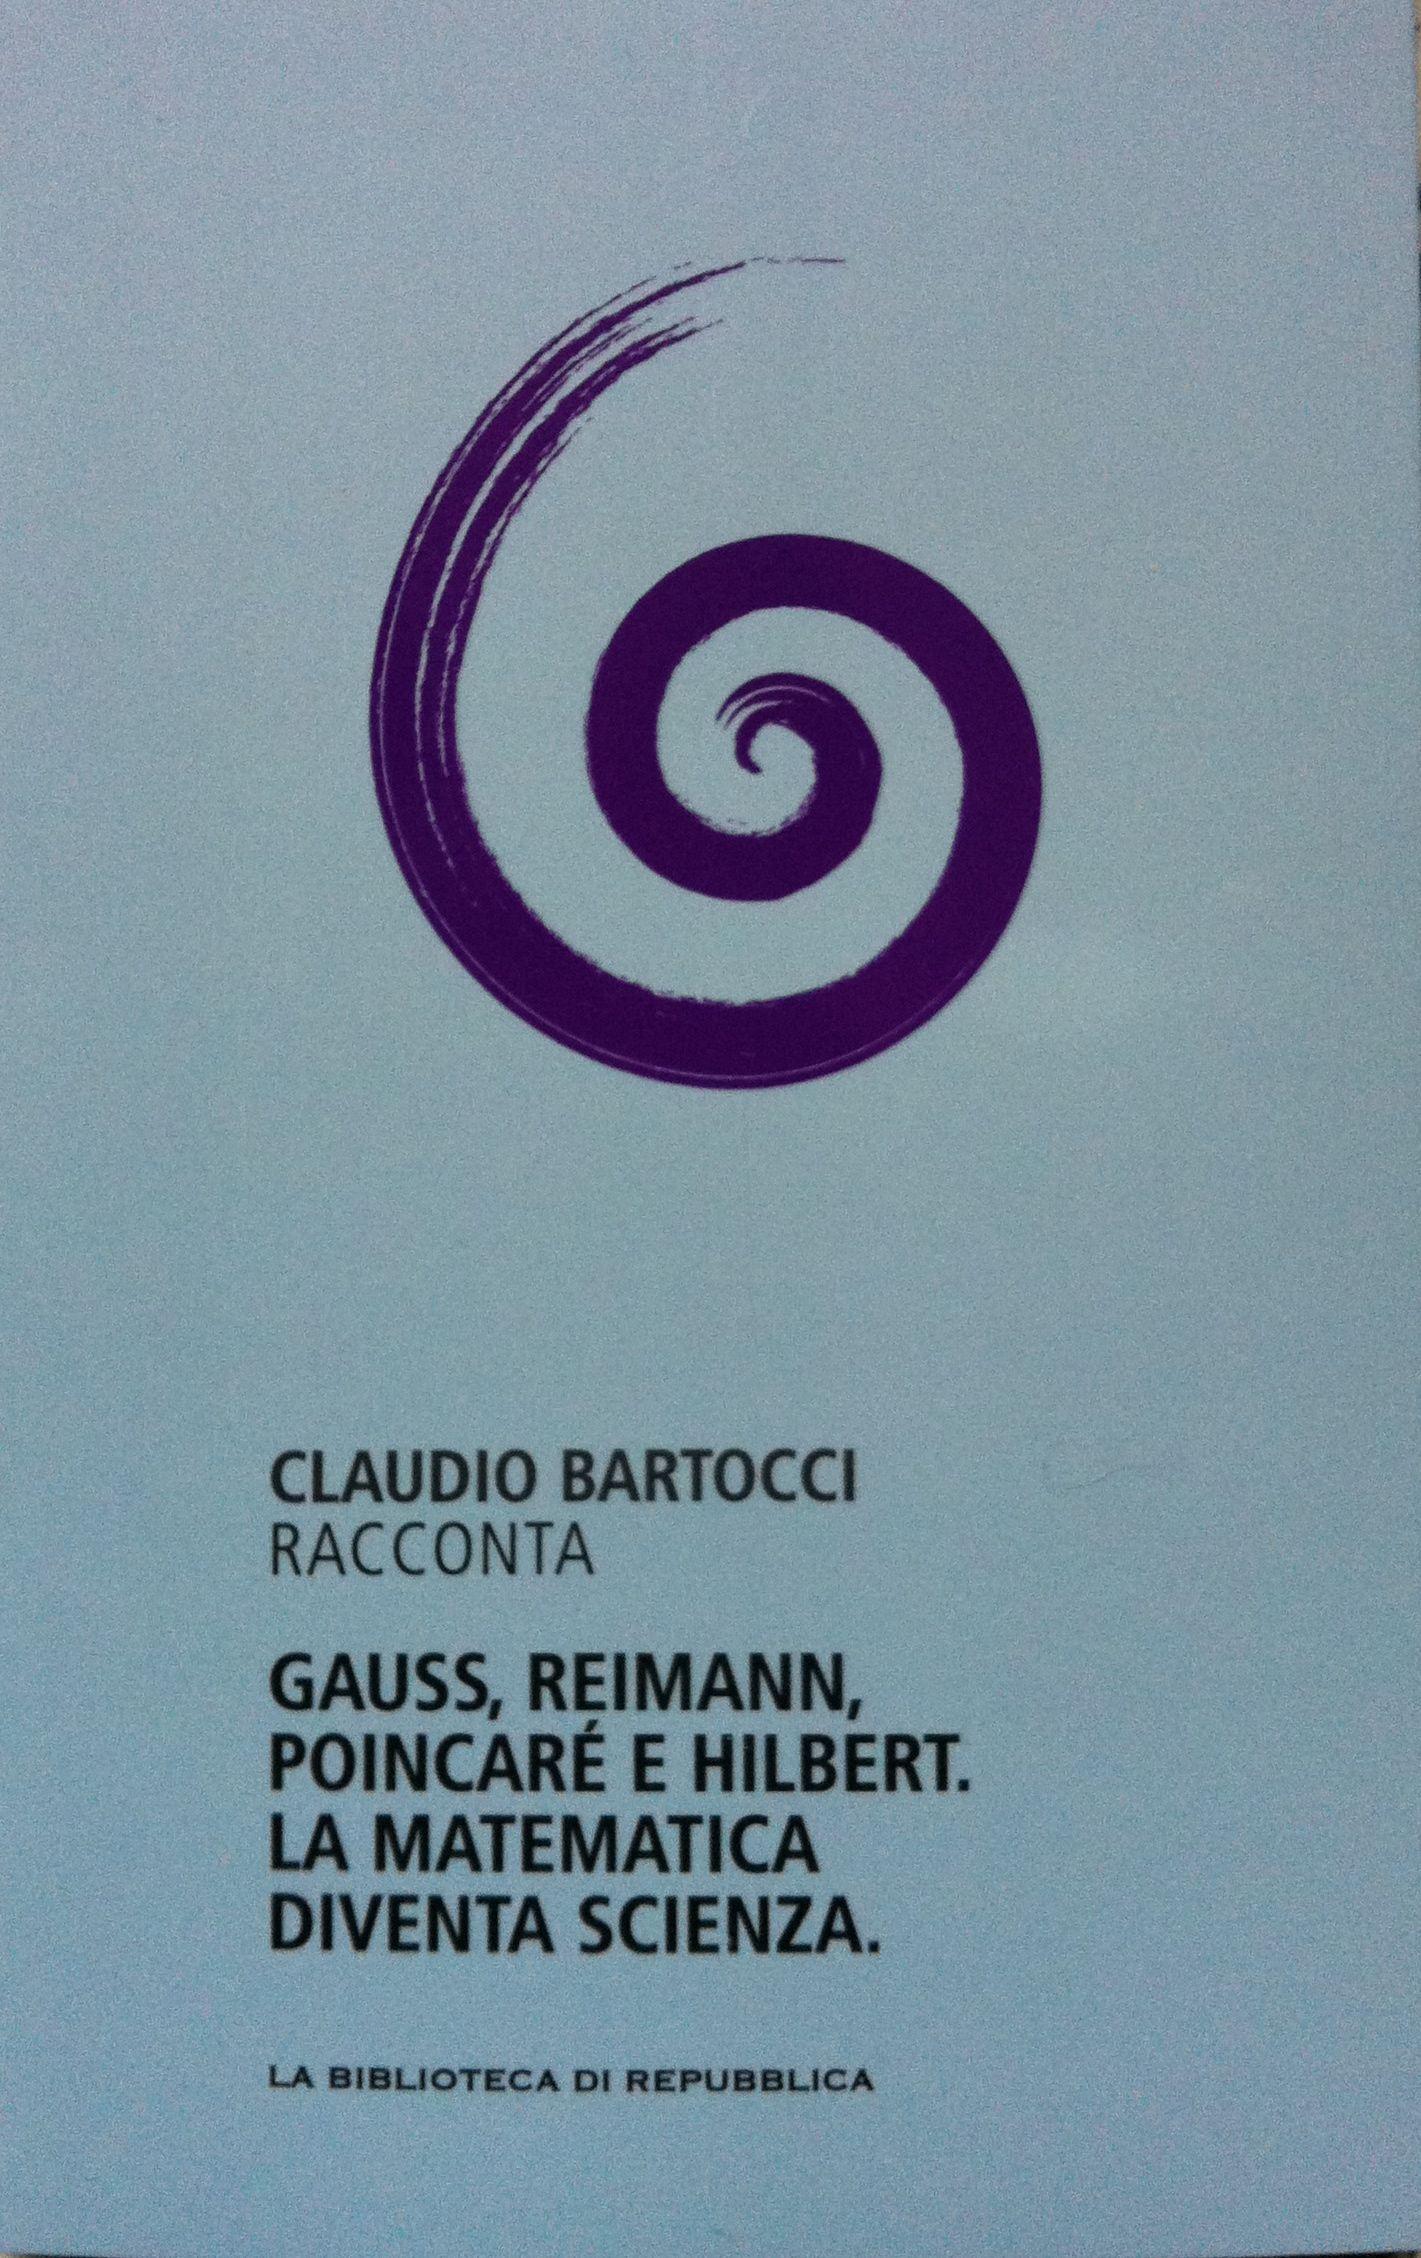 Claudio Bartocci racconta Gauss, Riemann, Poincaré e Hilbert. La matematica diventa scienza